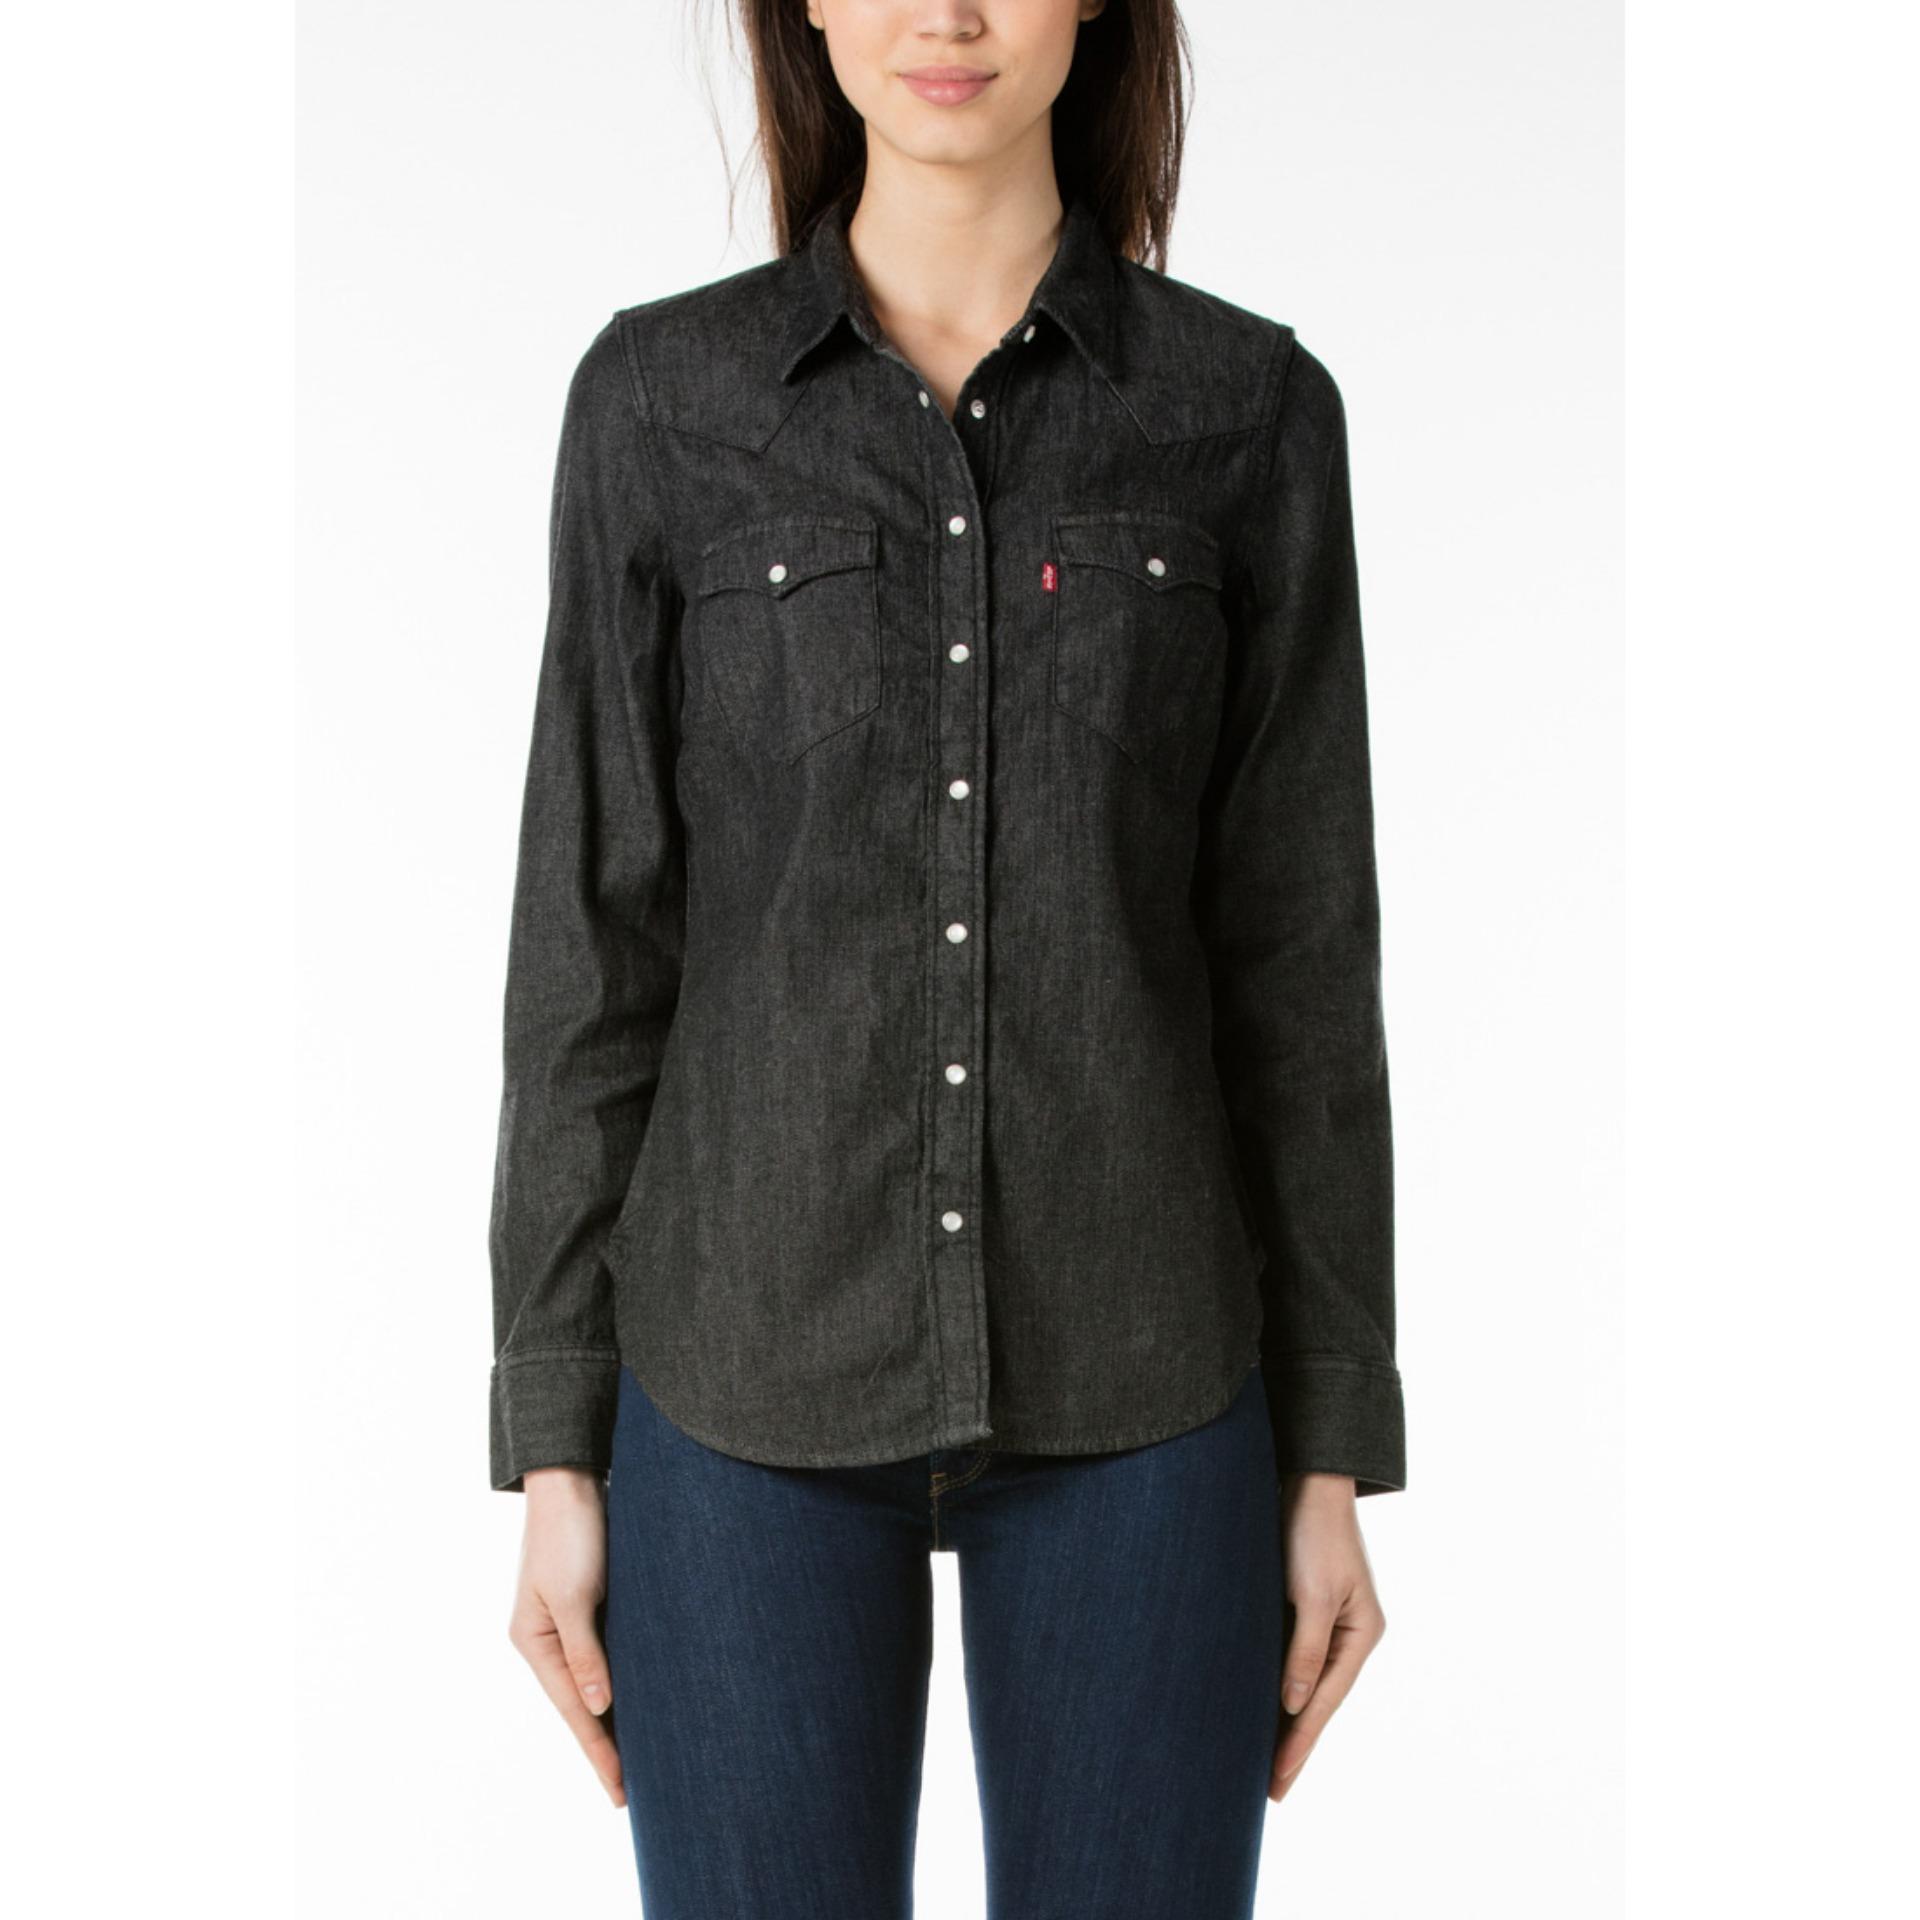 Levi's Tailored Classic Western Shirt - Vintage Black LVSBDAY